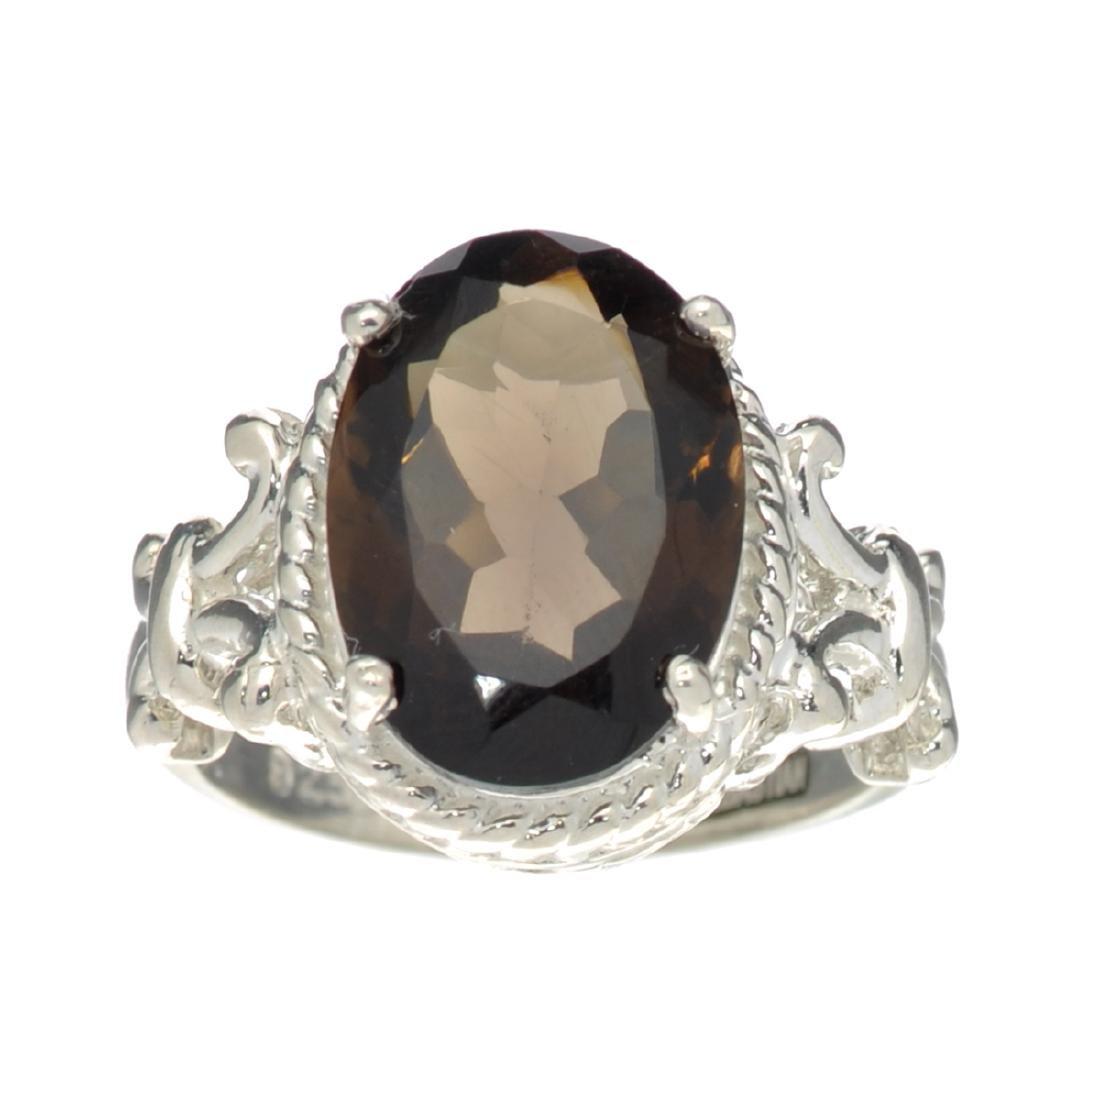 APP: 0.5k Fine Jewelry Designer Sebastian, 3.91CT Brown